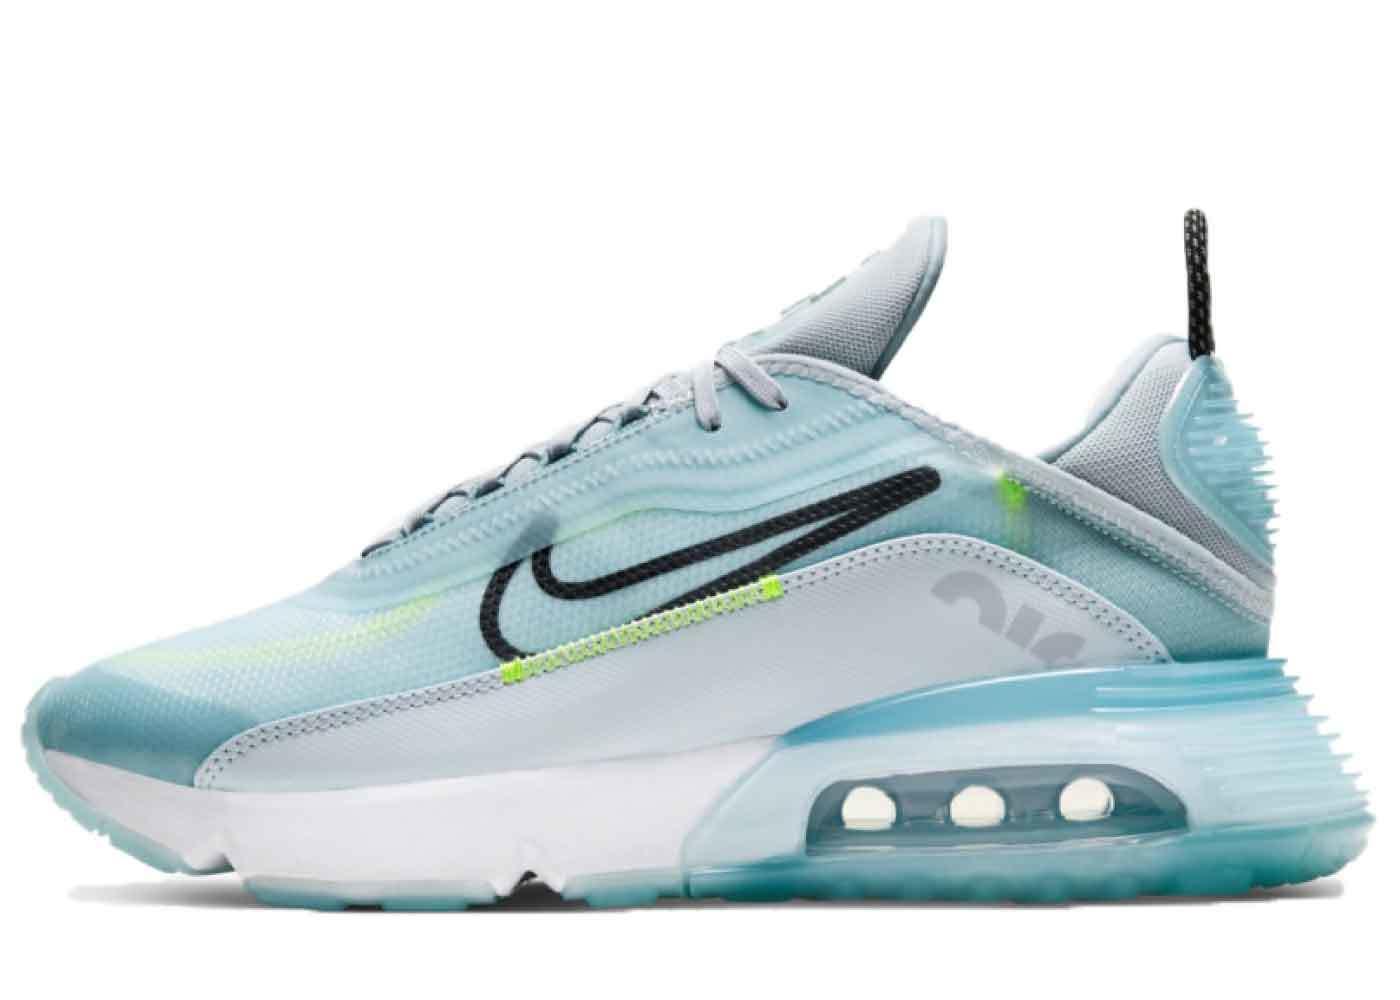 Nike Air Max 2090 Ice Blueの写真